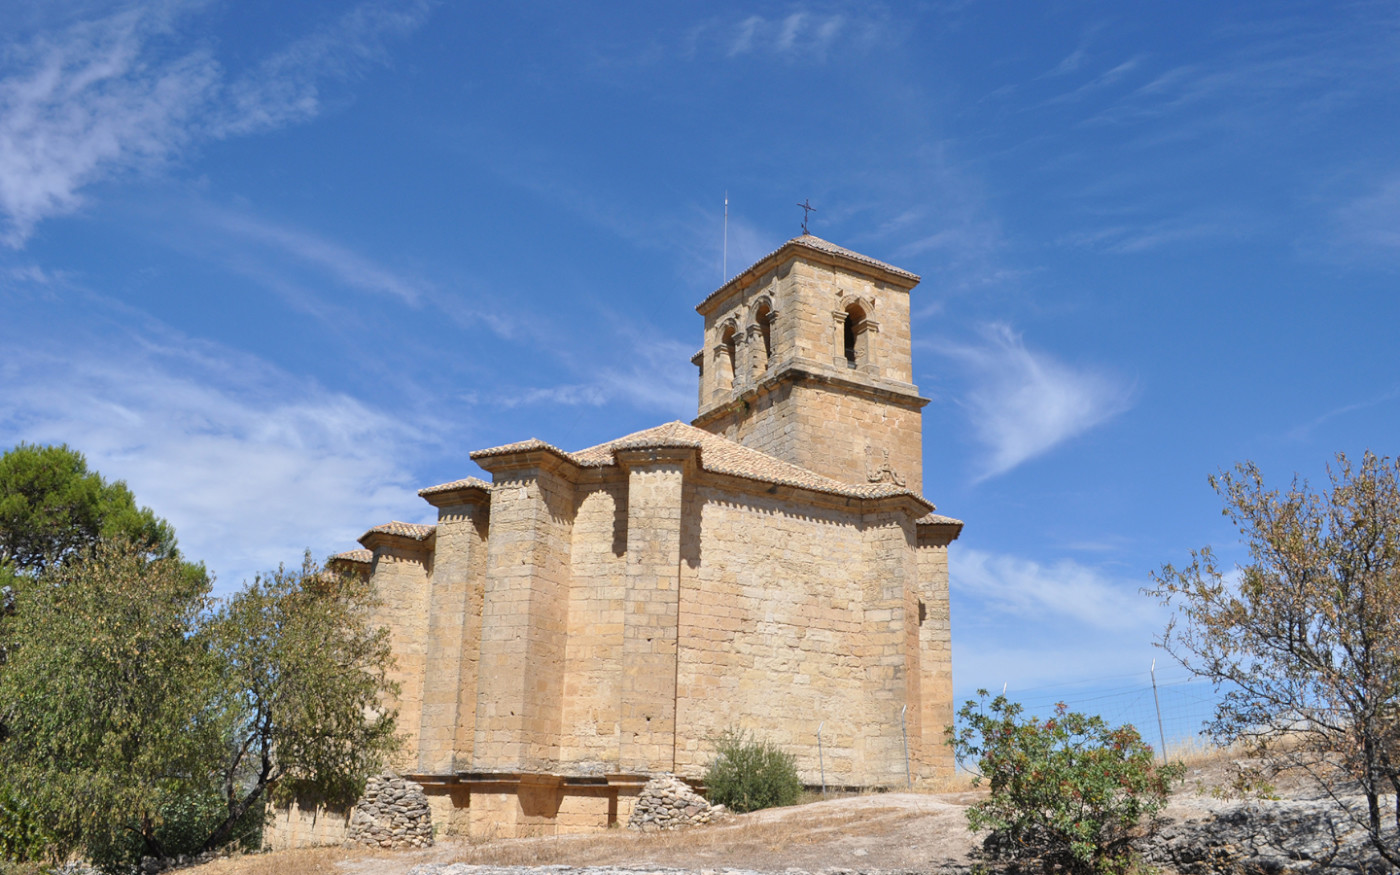 castillo_de_la_villa_montefriohuerta_pequena_self catering_holiday_accommodation_Montefrio_www.rural-andalucia.com